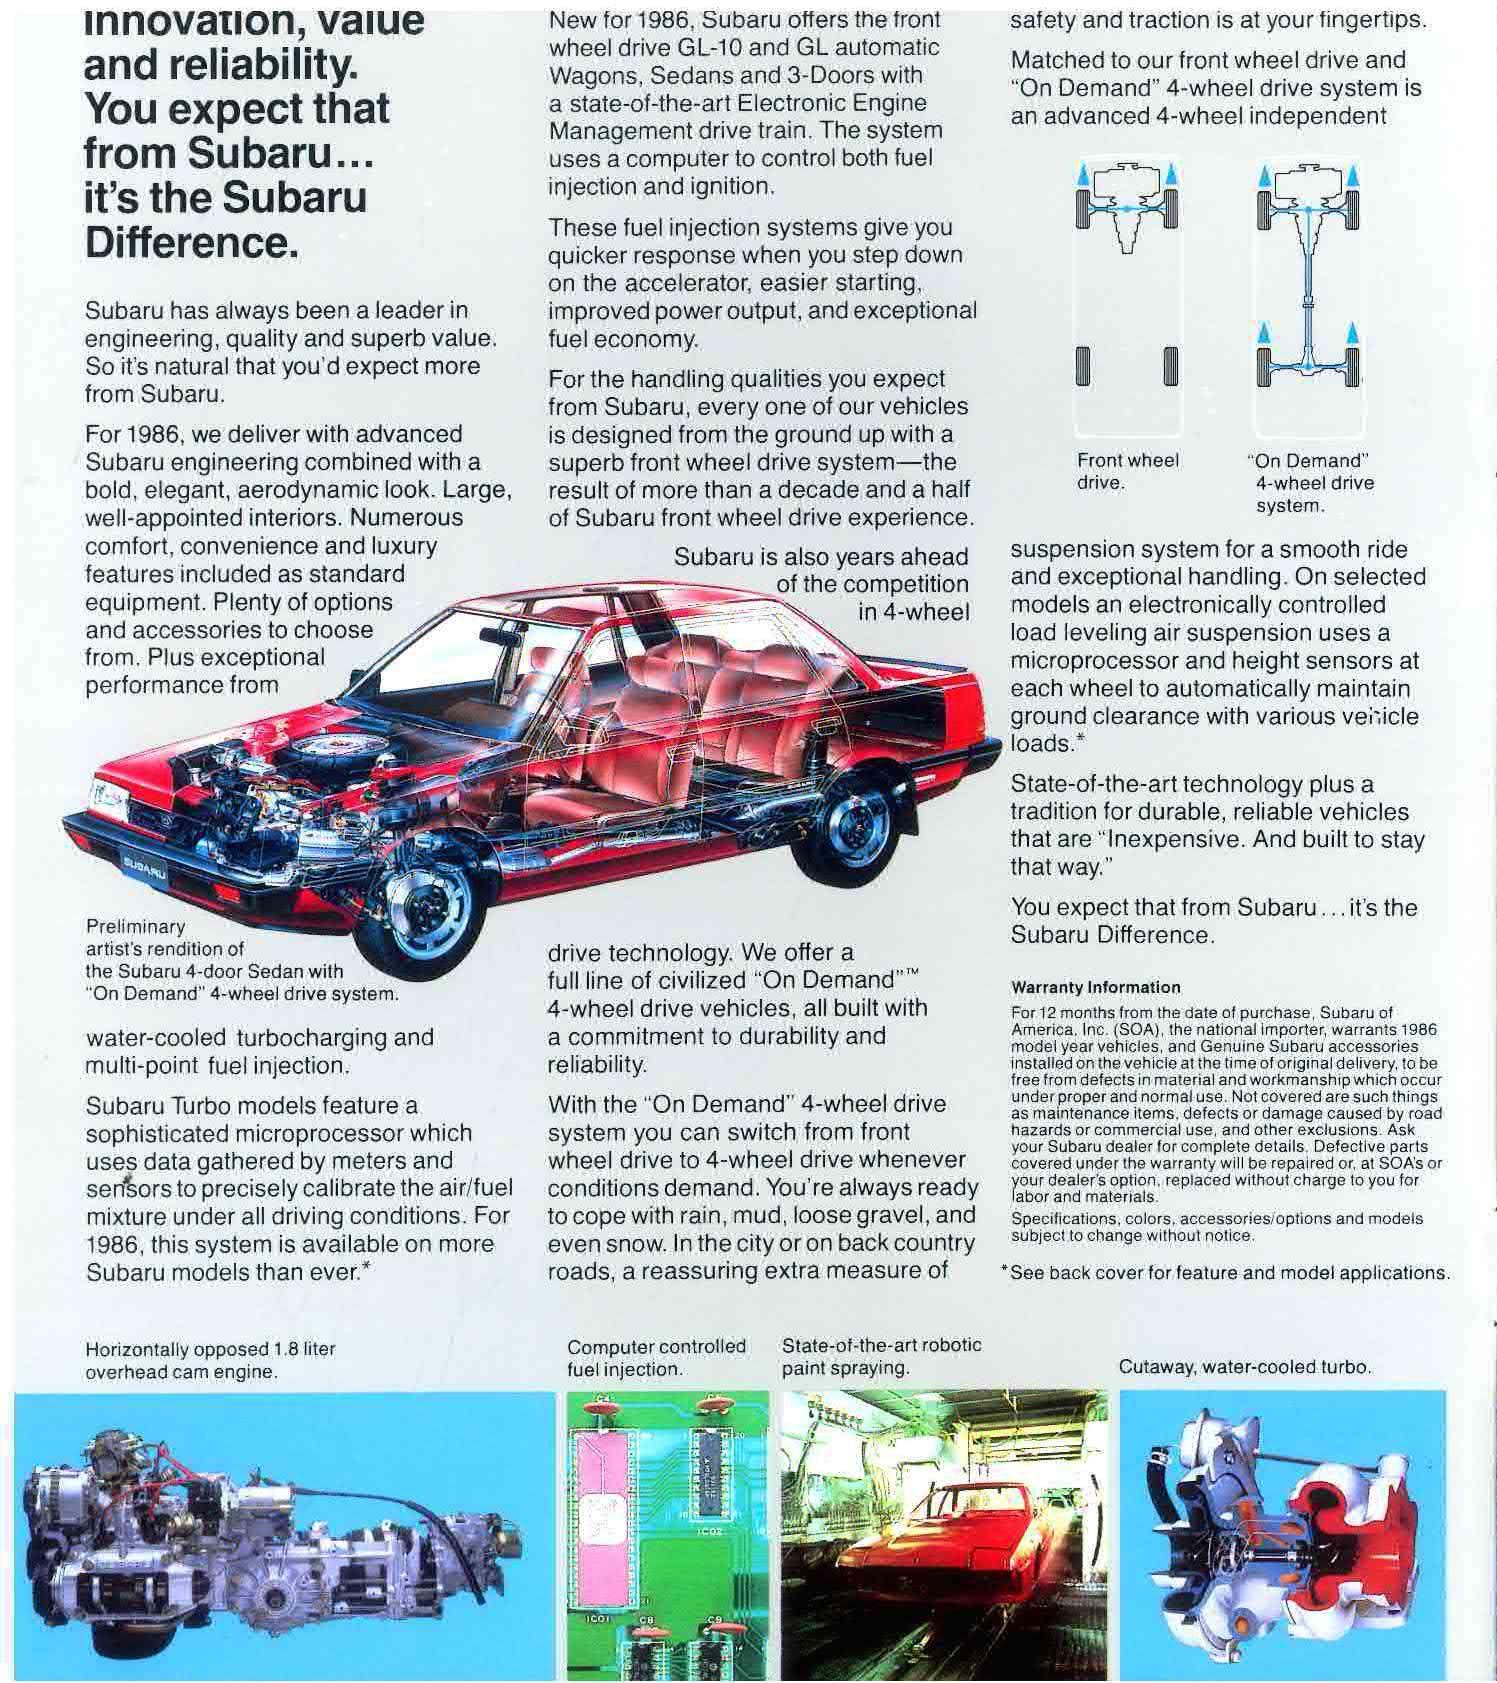 1986 Subaru Brochure Vintage Retro Print Advertising Used Subaru Subaru Toy Car